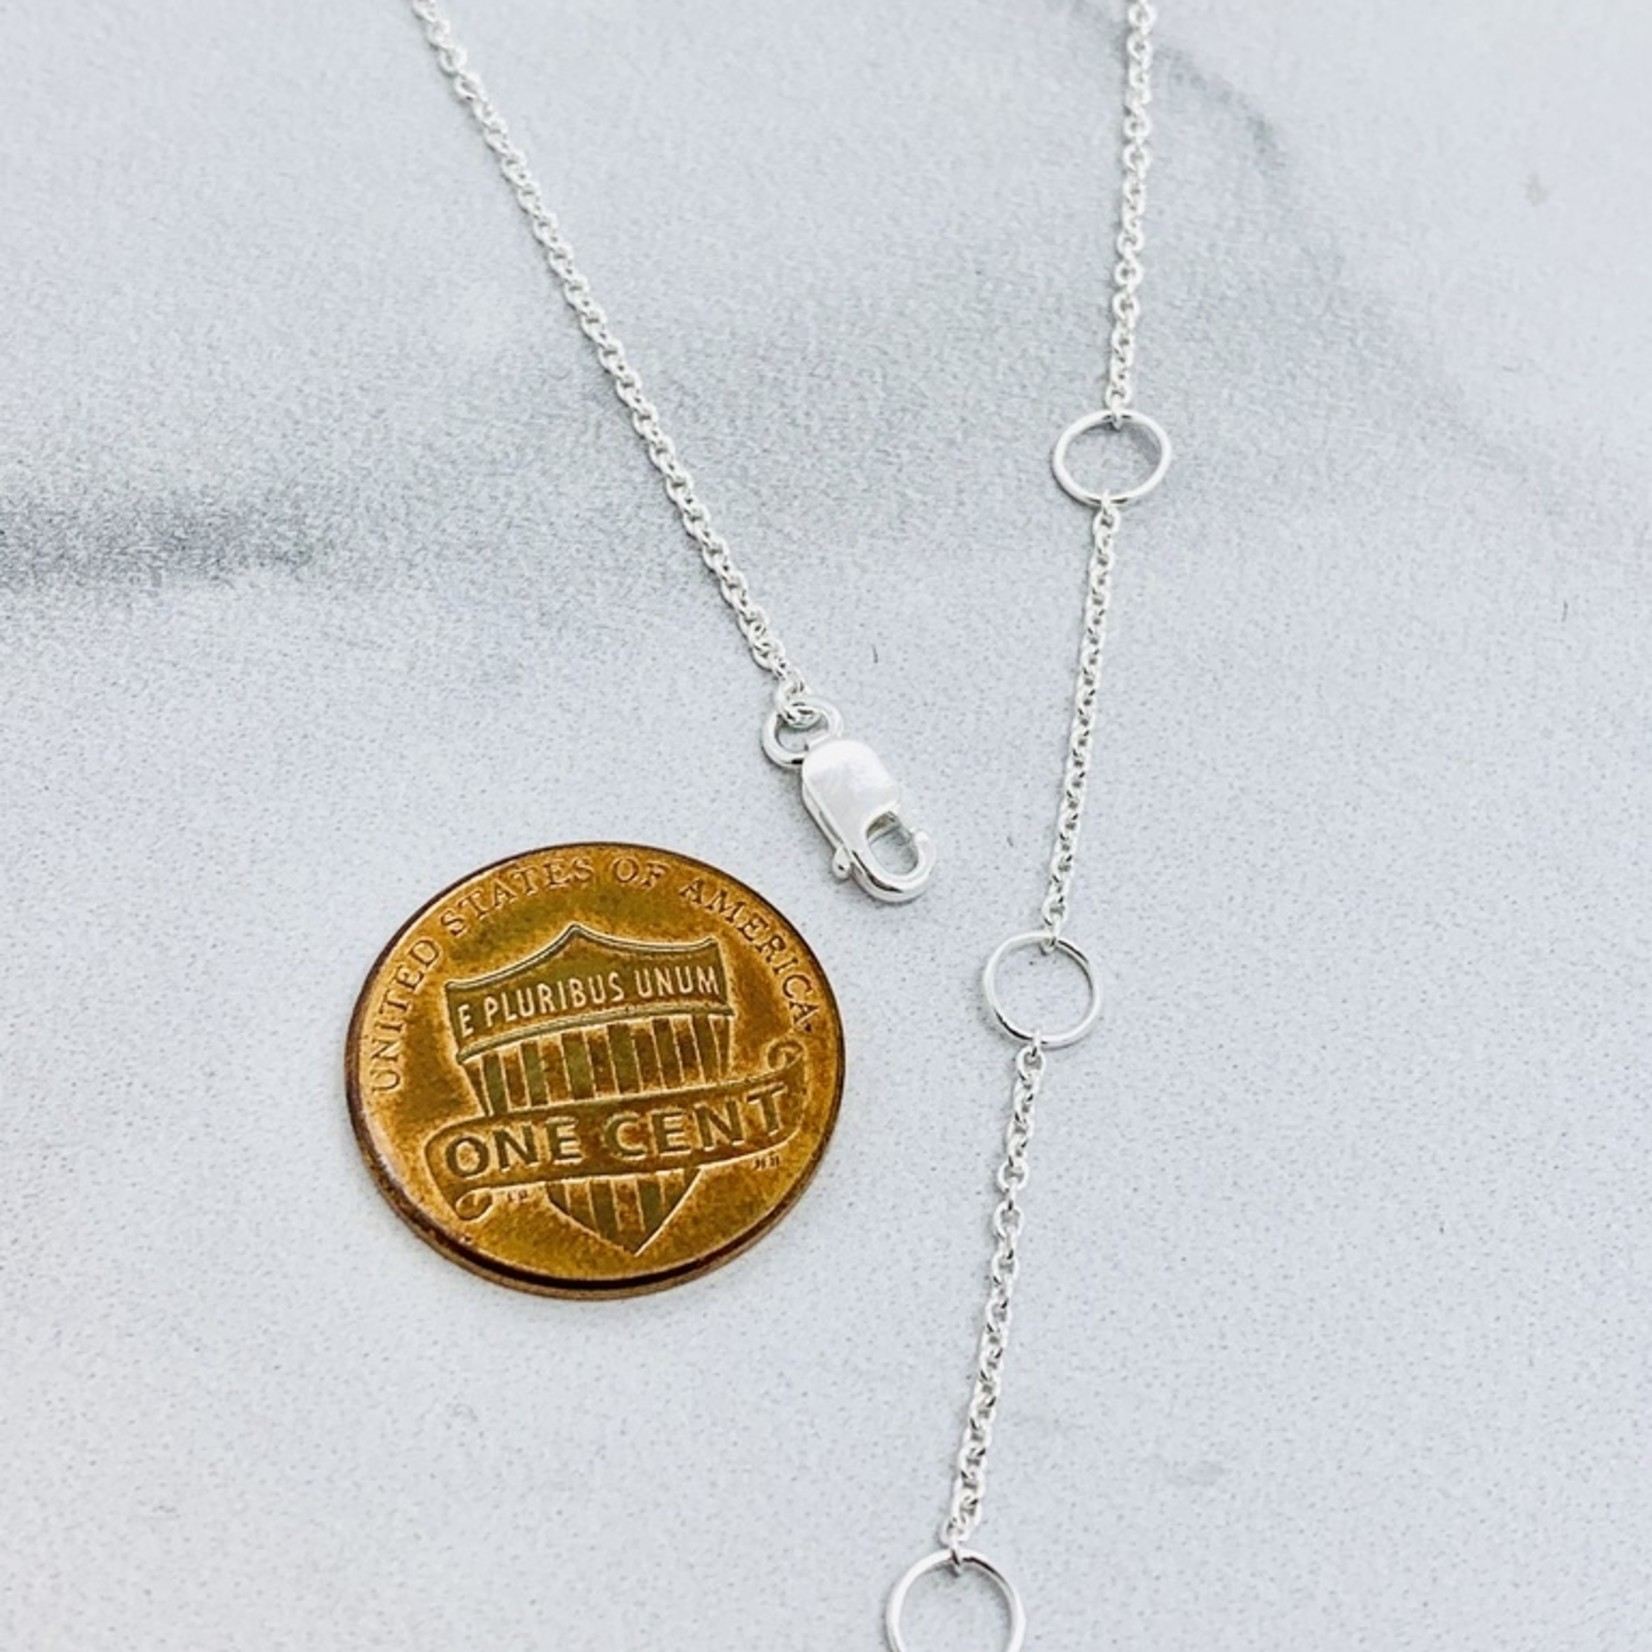 Brushed Sterling Silver Curved Bar necklace with Bezel Set CZ above